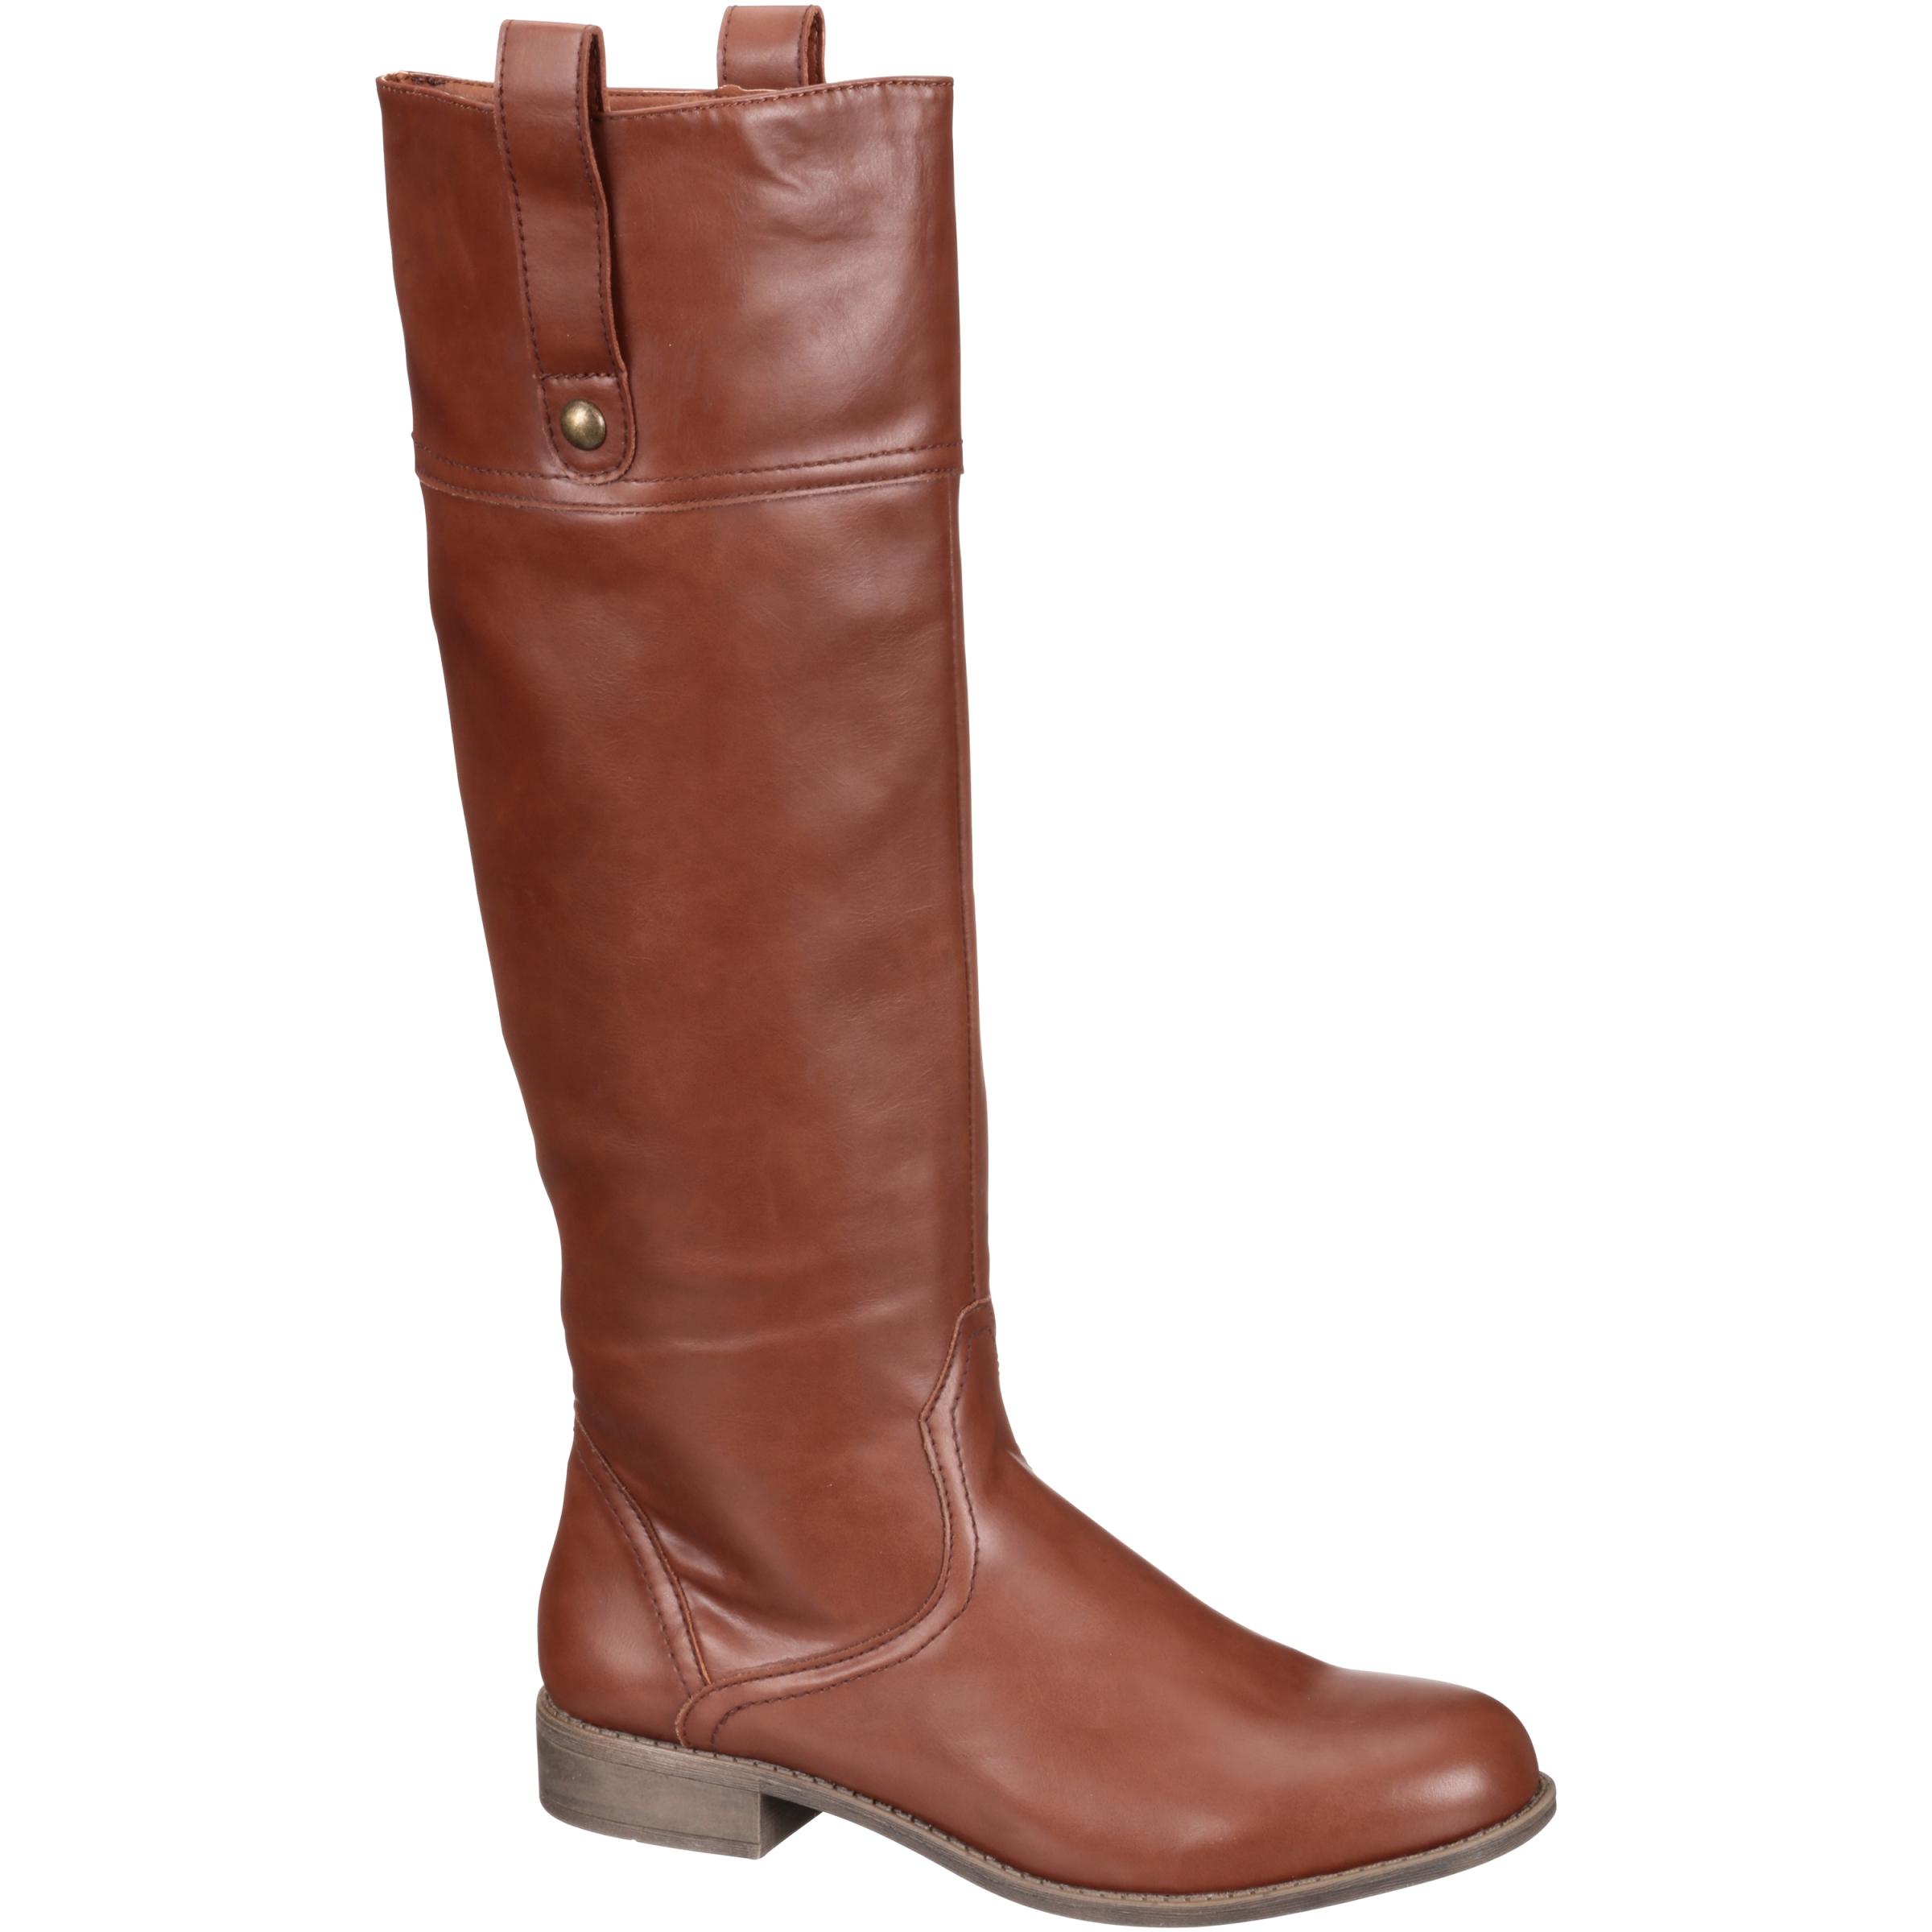 MoMo Women's Alani Boot Shoe Size: 9